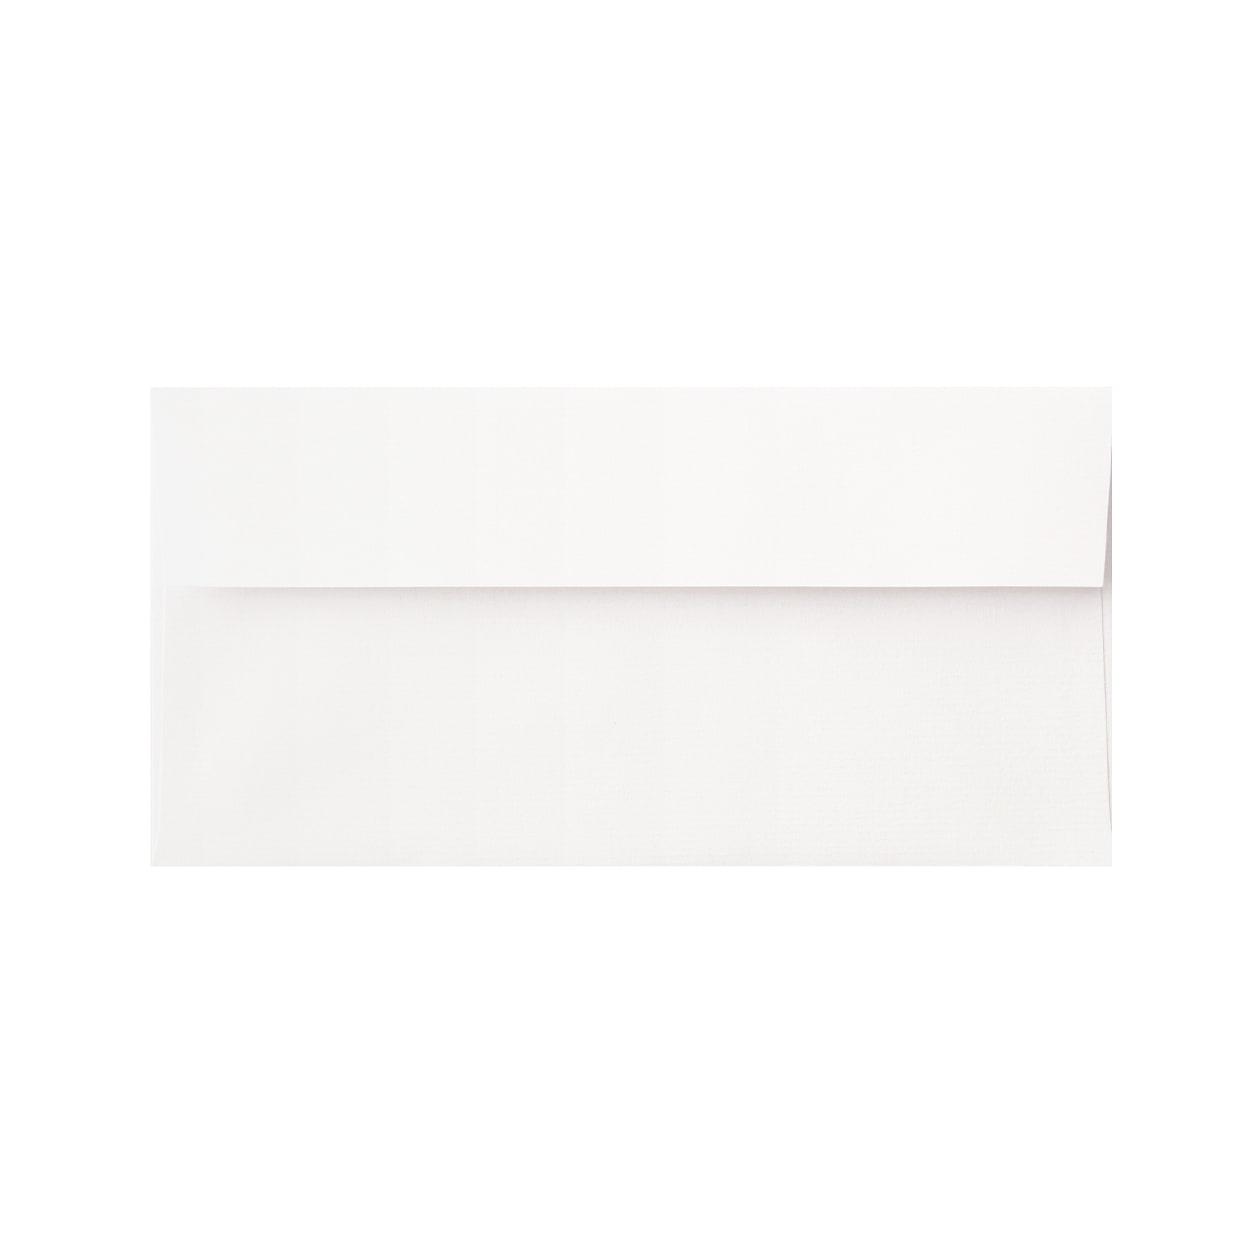 DLカマス封筒 コンケラー レイド ブリリアントホワイト 120g